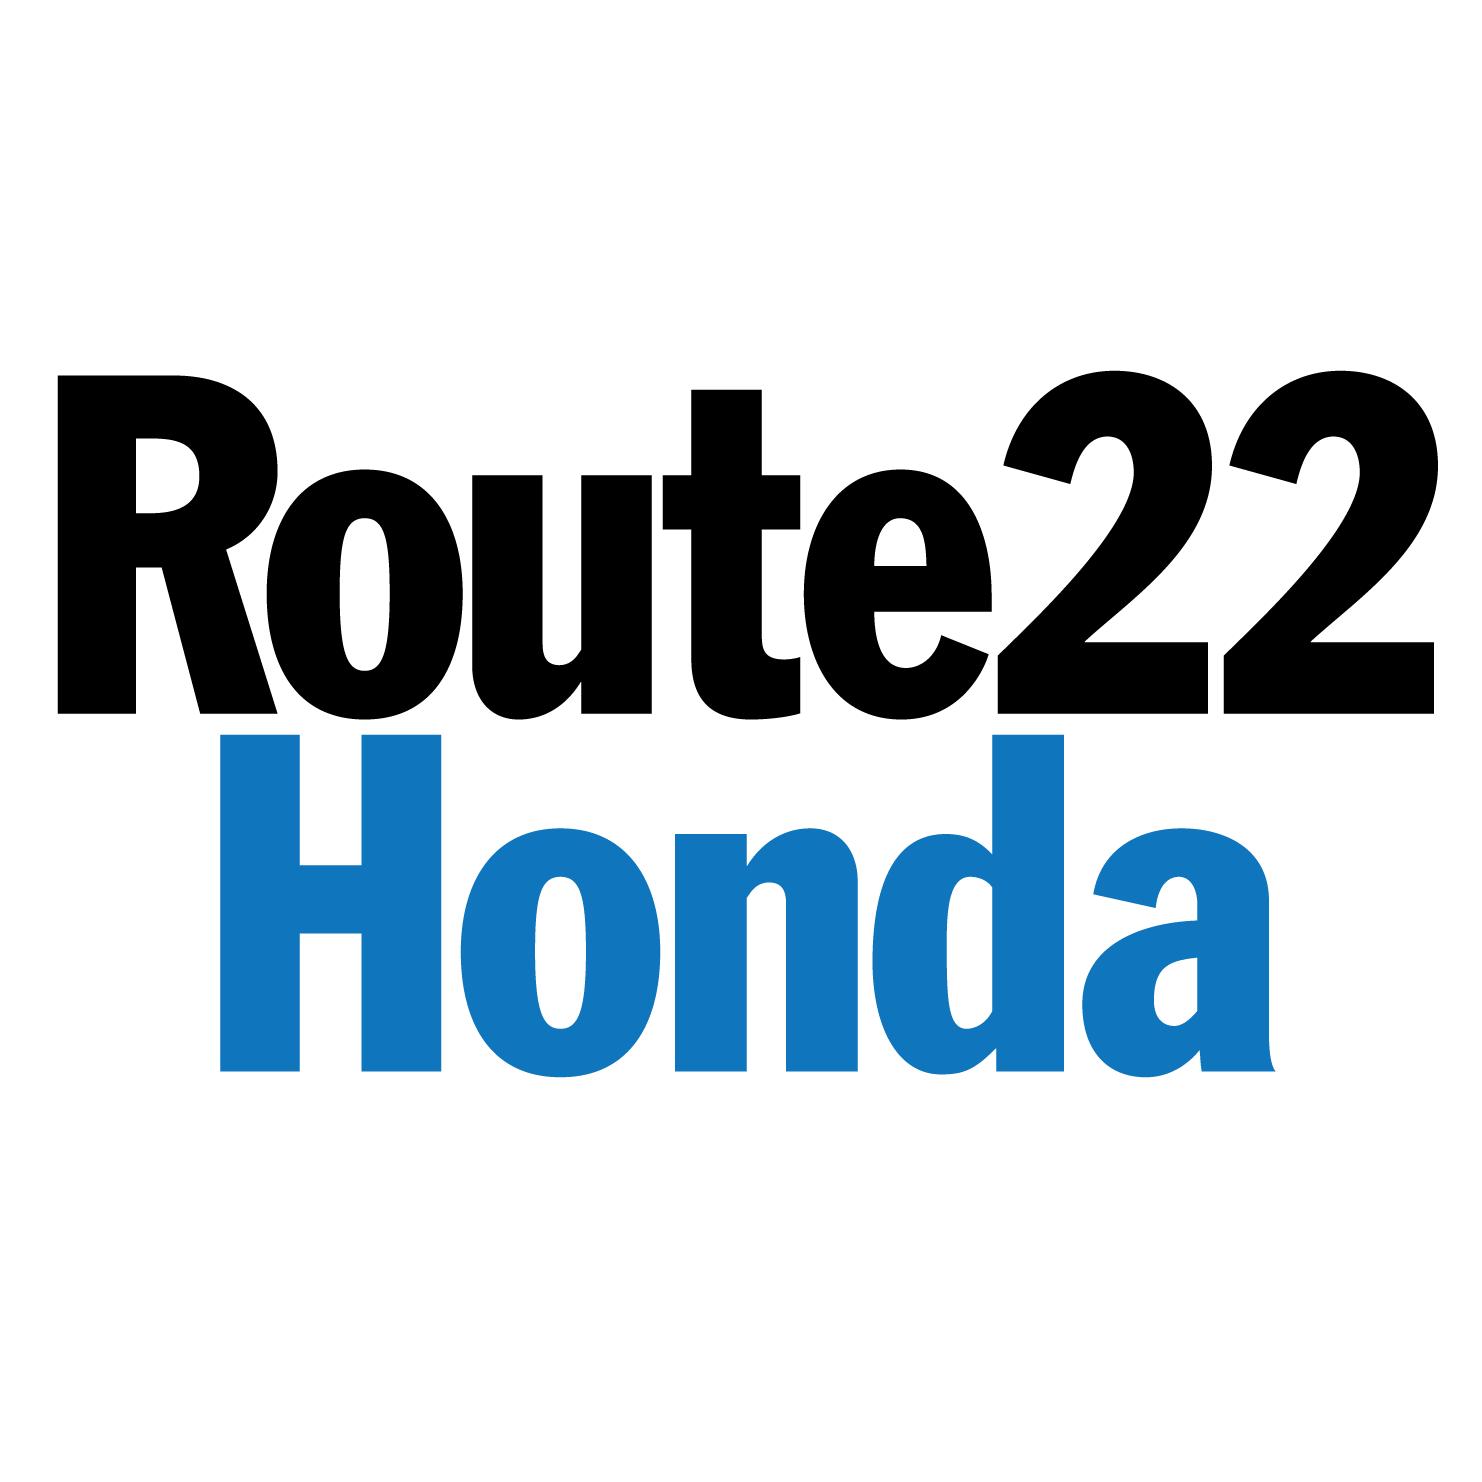 route 22 honda service & parts - hillside, nj 07205 - (833)255-6910